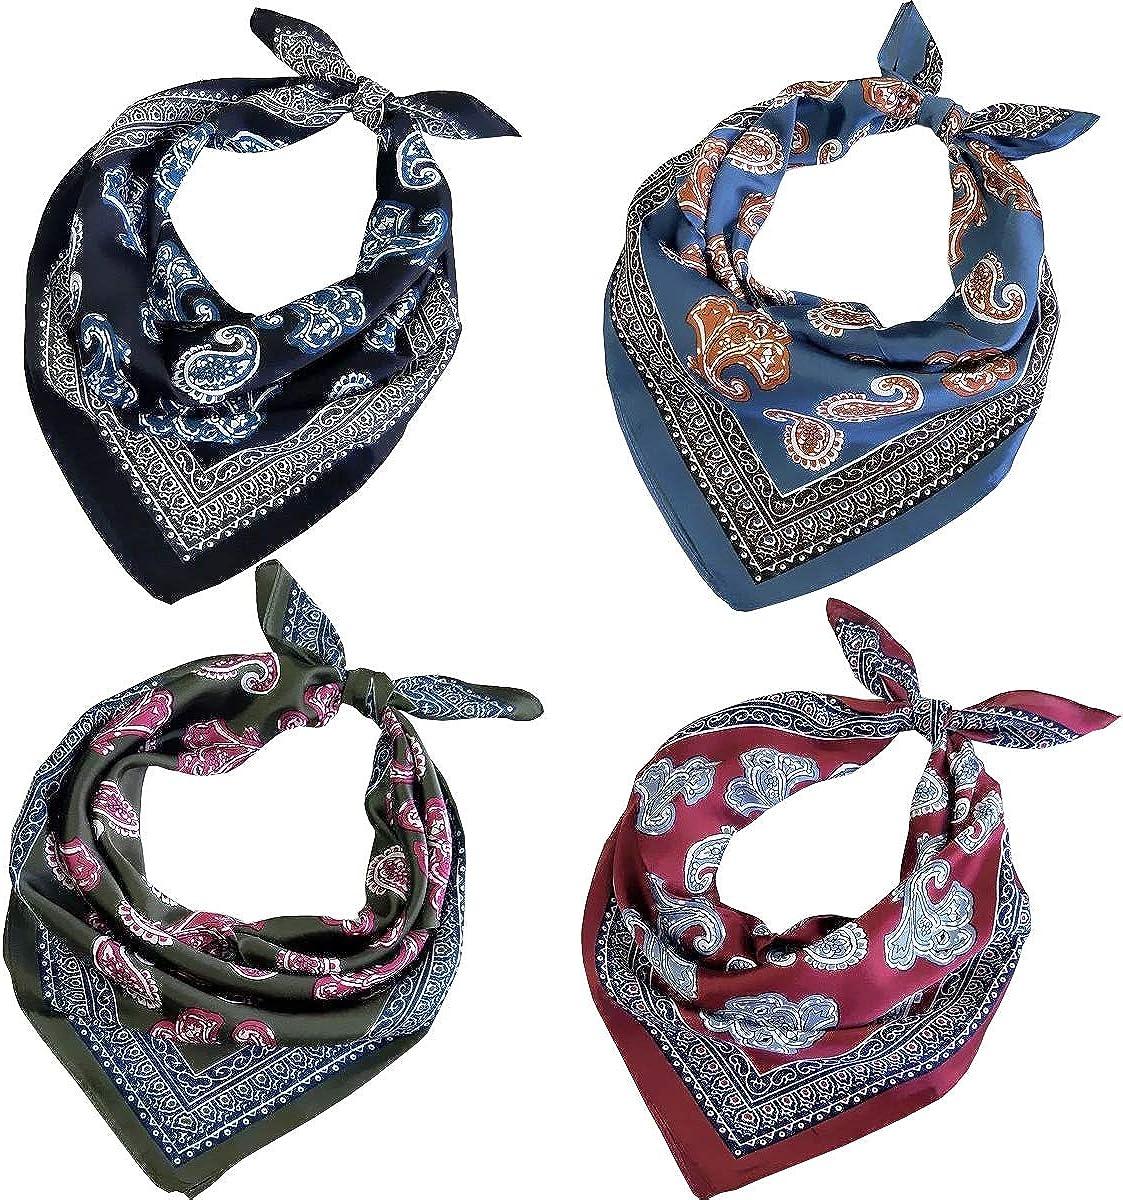 FYLuoke Silk Feeling Satin HeadScarf Neck Hair Scarf Bandana for Women 4-Packs